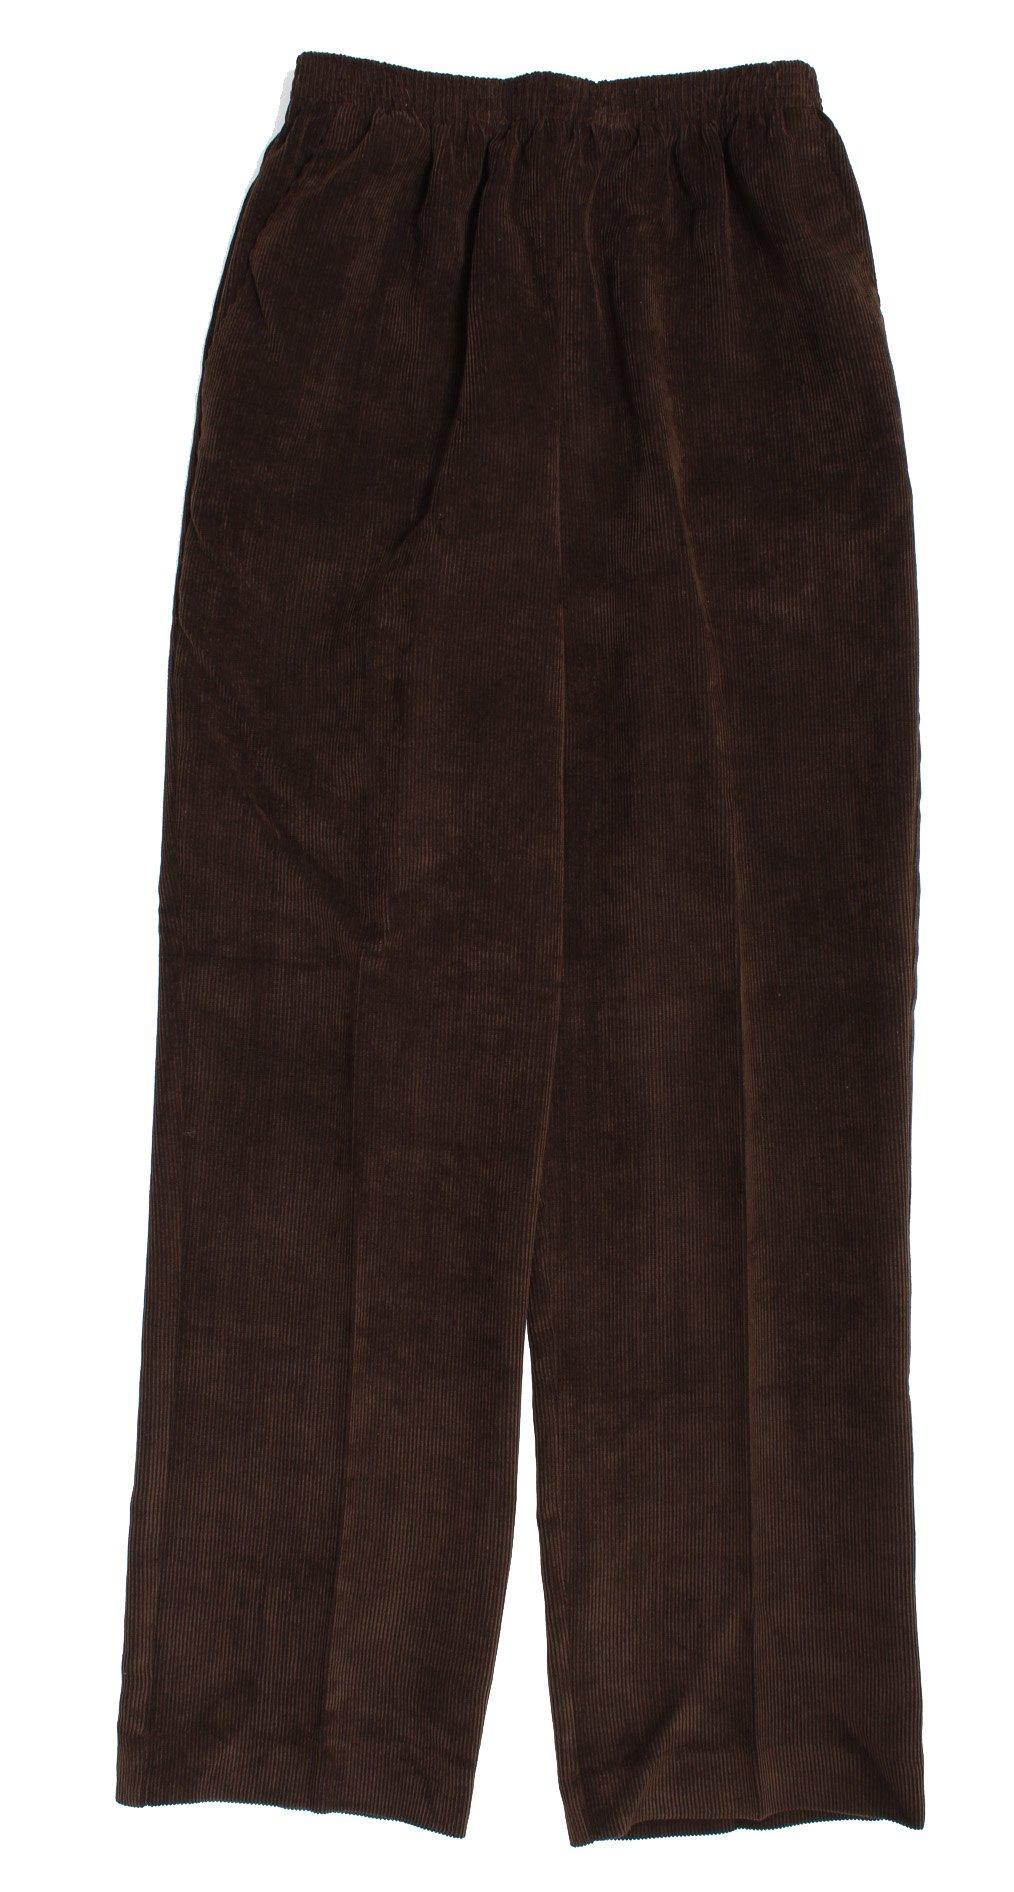 Alfred Dunner Classics Elastic Waist Corduroy Pants Brown 10P S